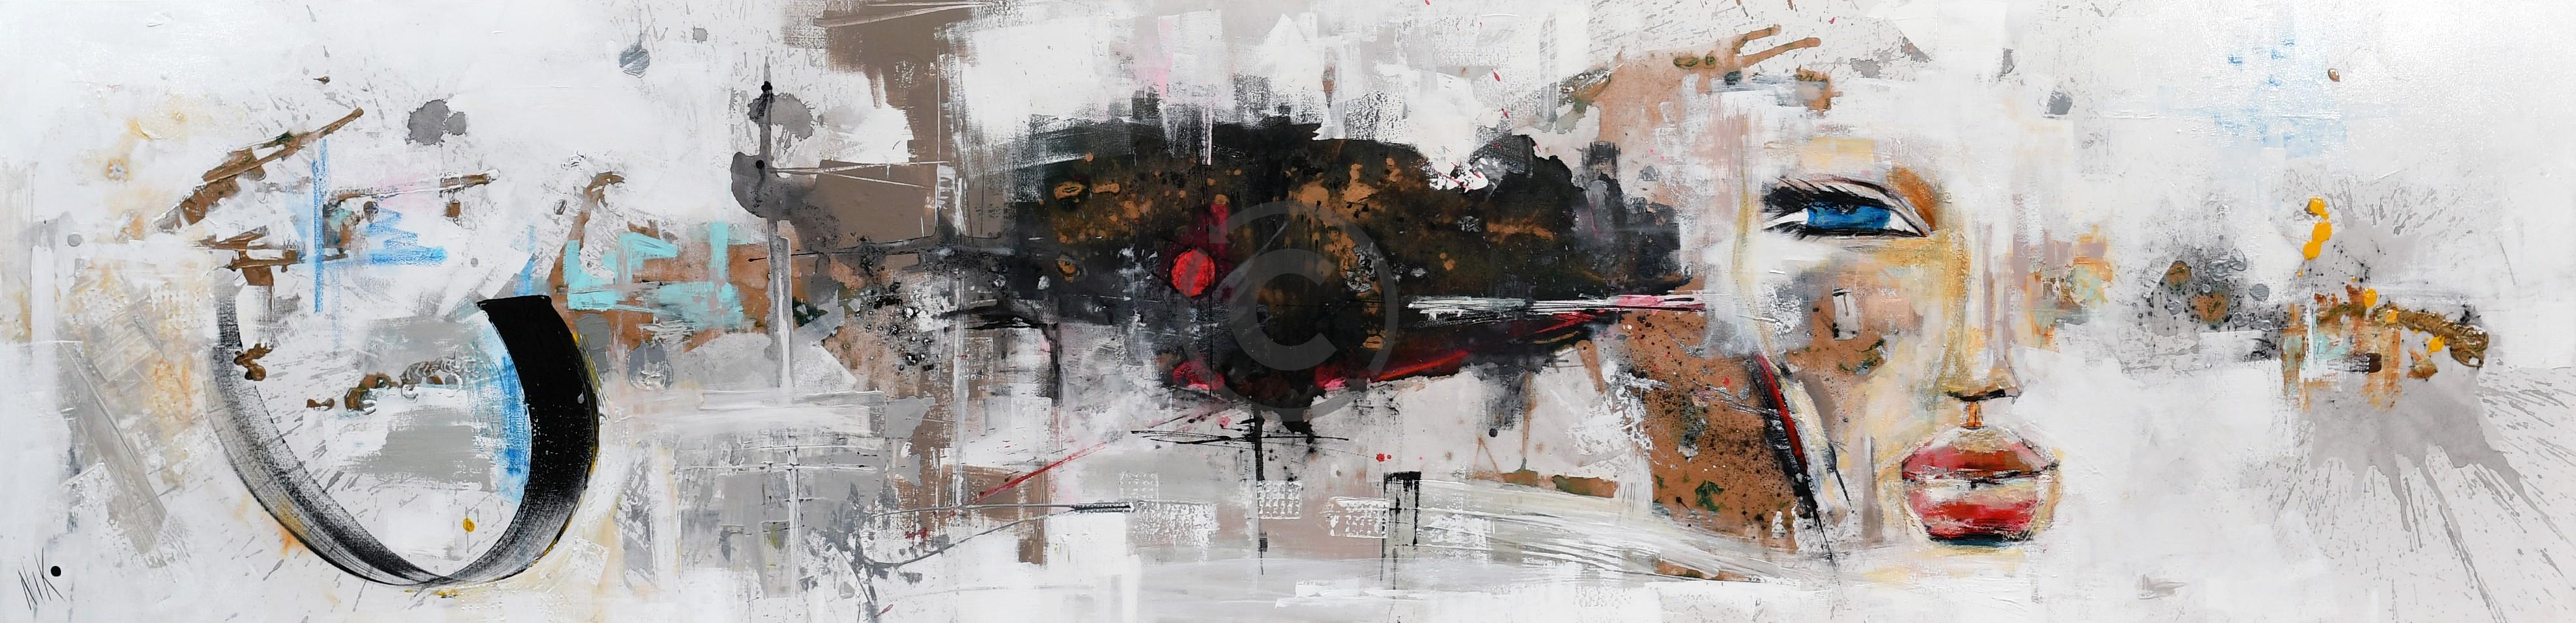 Vivre Glorieusement | Niko | Artiste peintre